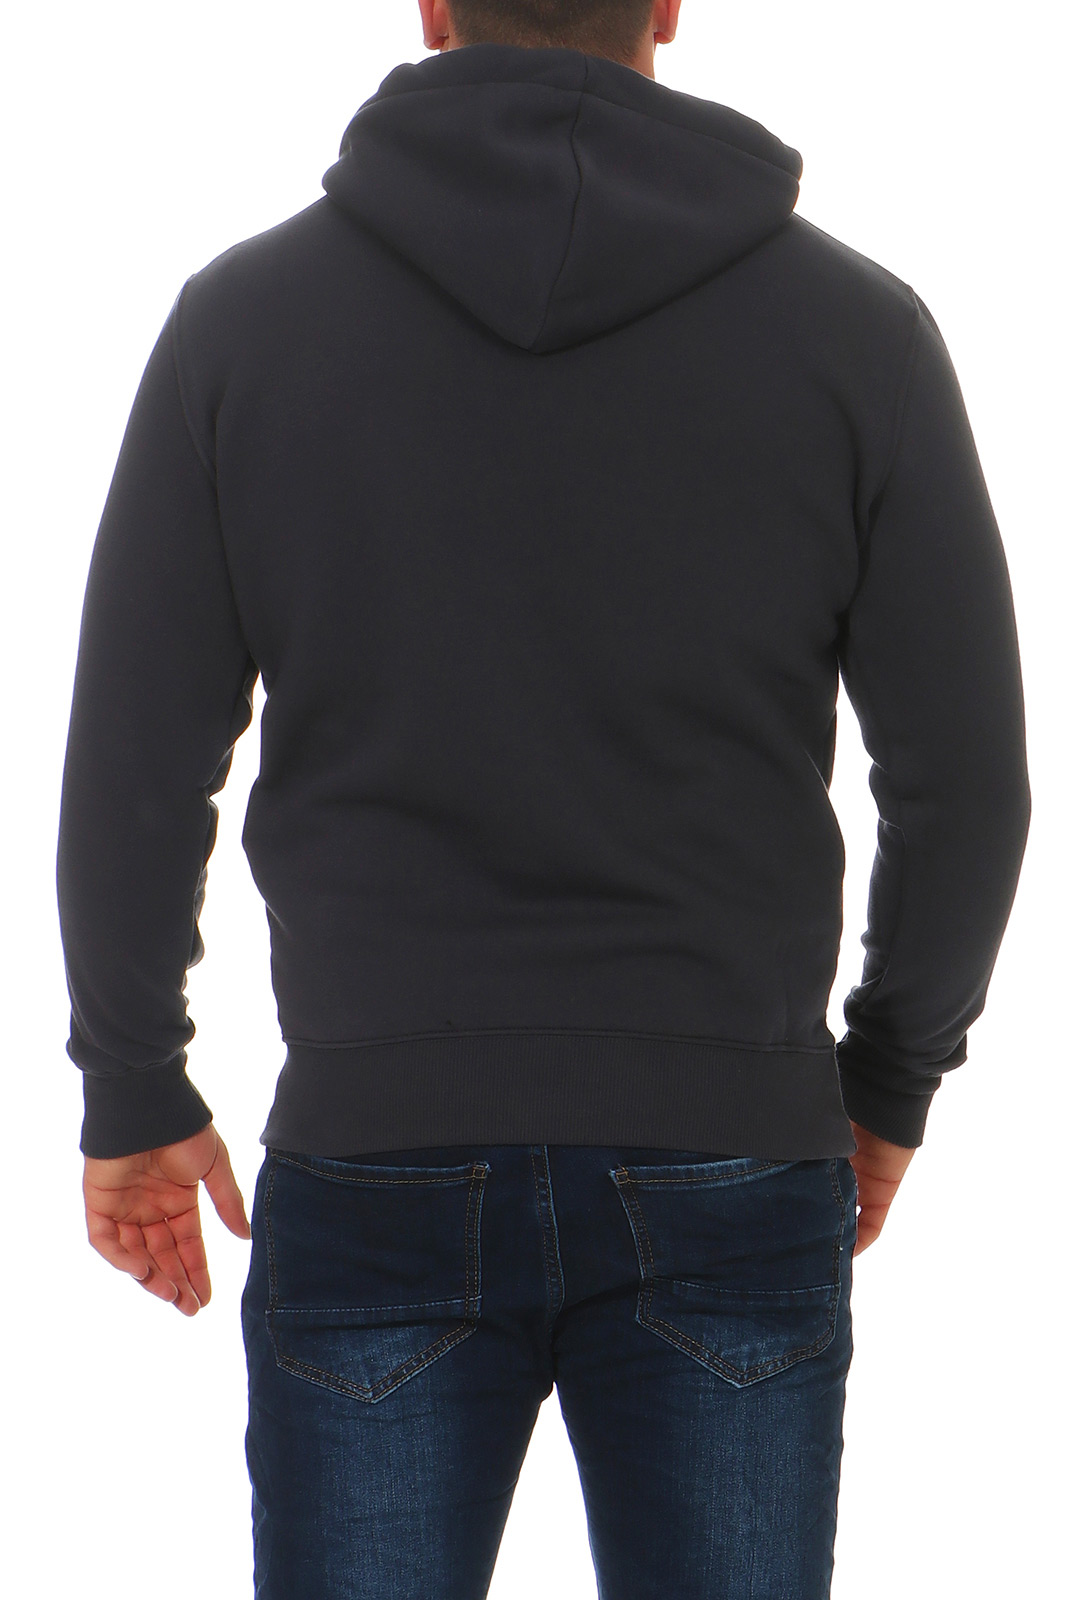 Alpha-Industries-Uomo-Hoody-Pullover-Basic-sweater-NUOVO-178312-hoodie-s-3xl miniatura 12